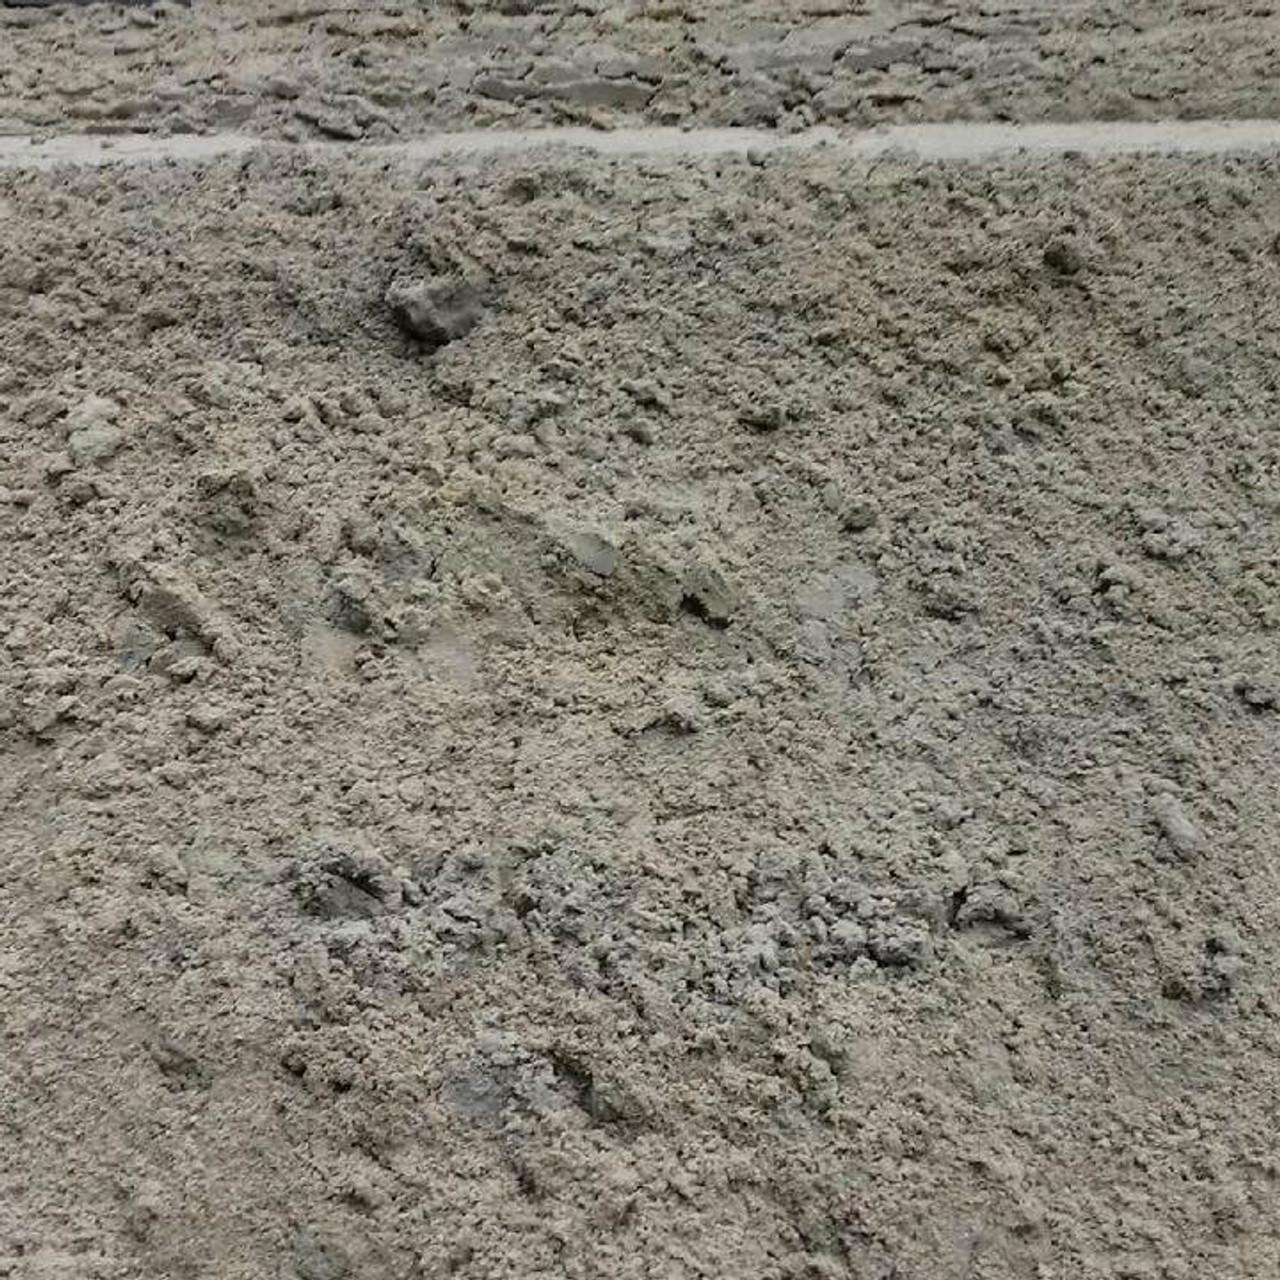 Chieveley Blonde Building Sand